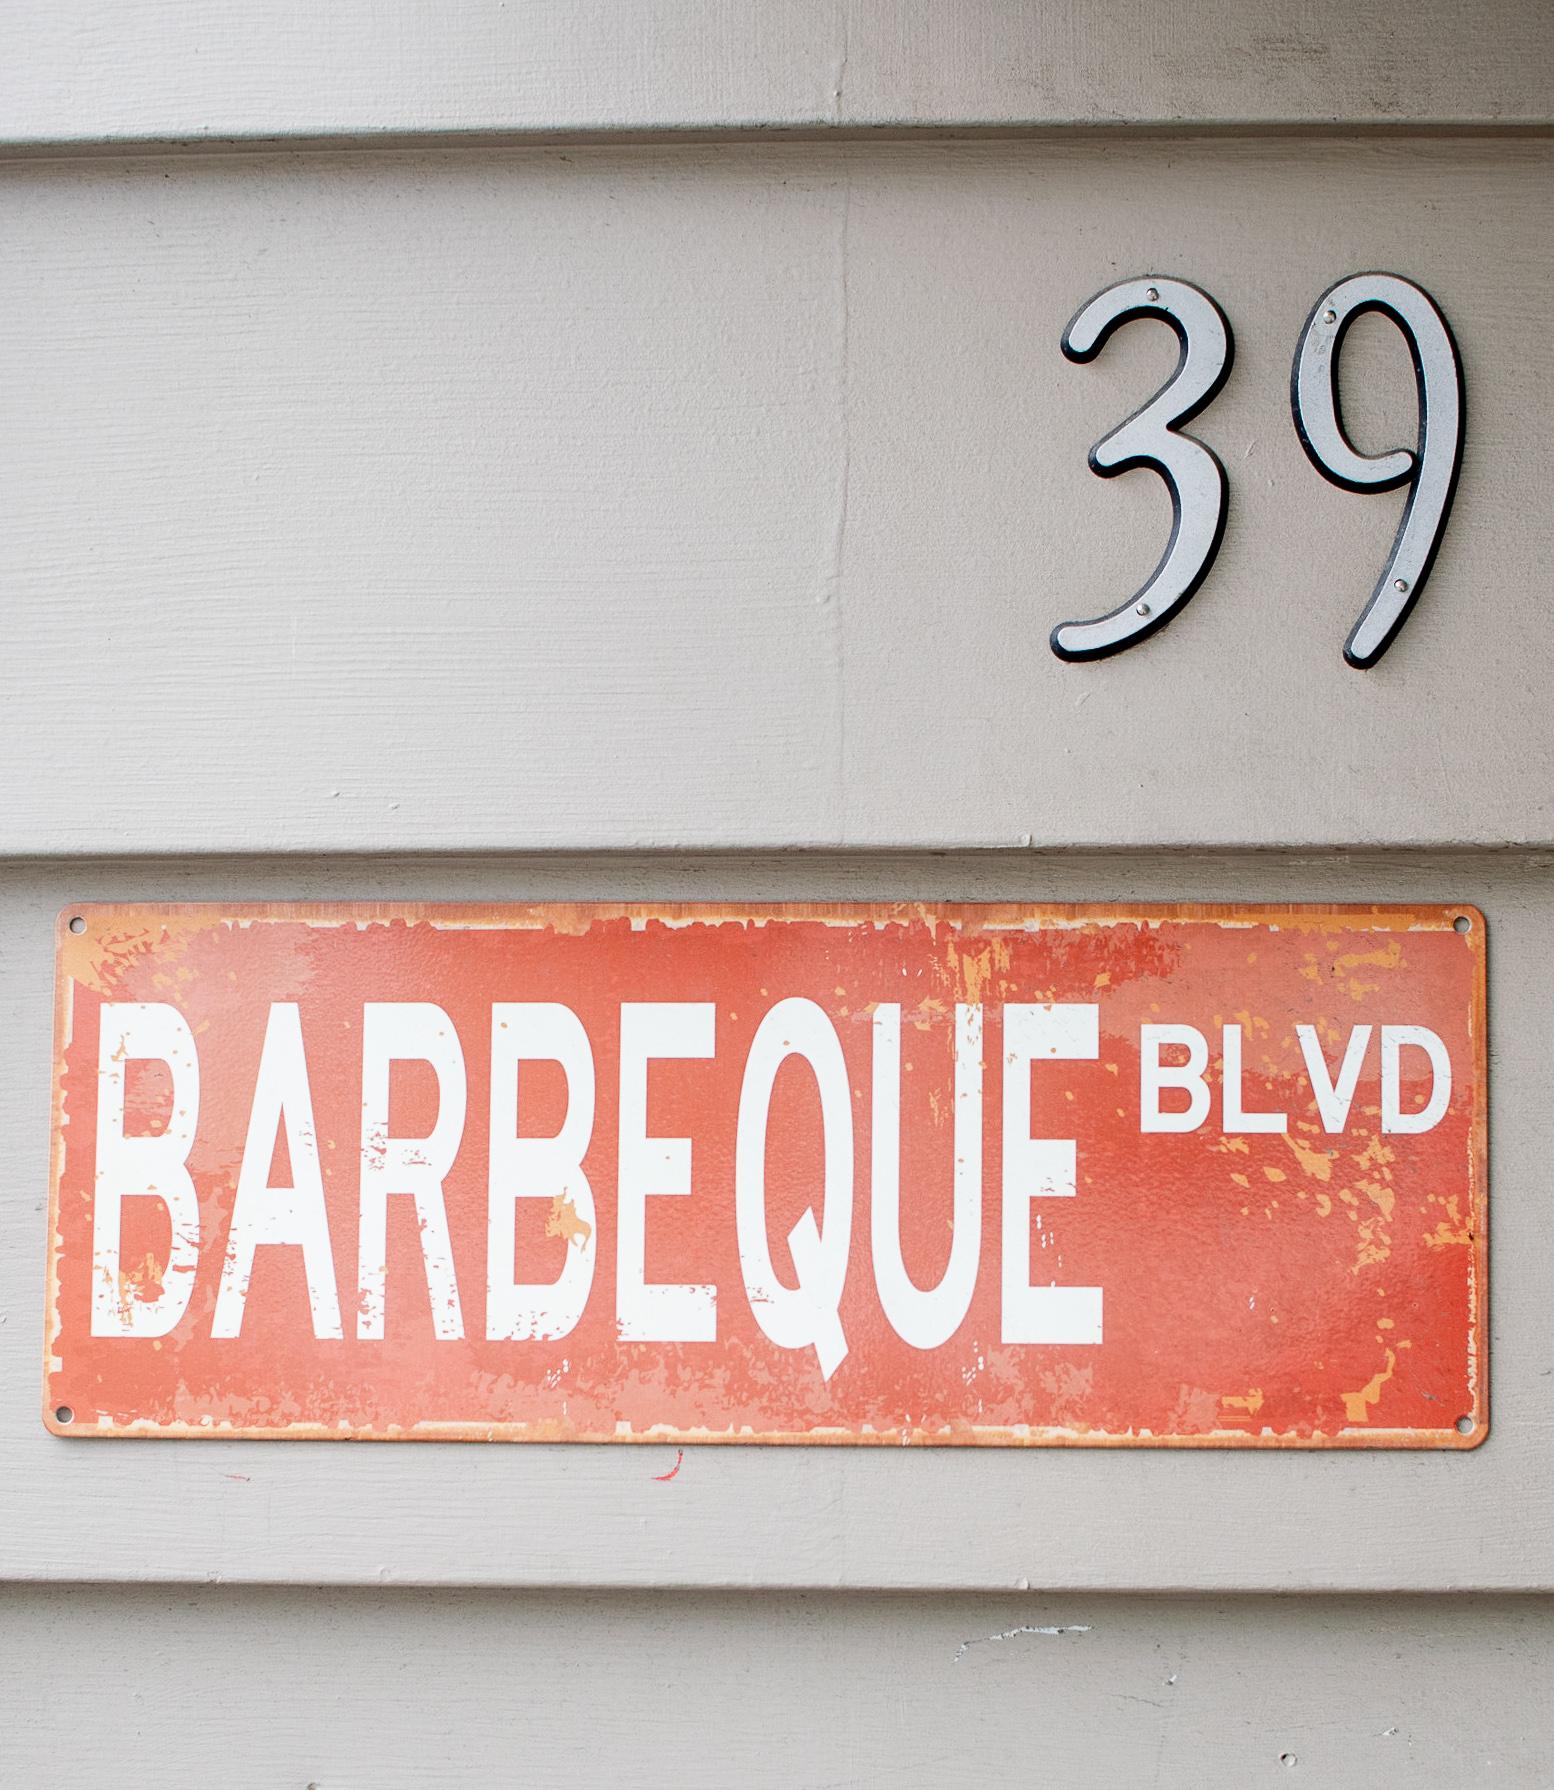 Hangover BBQ sign.jpg